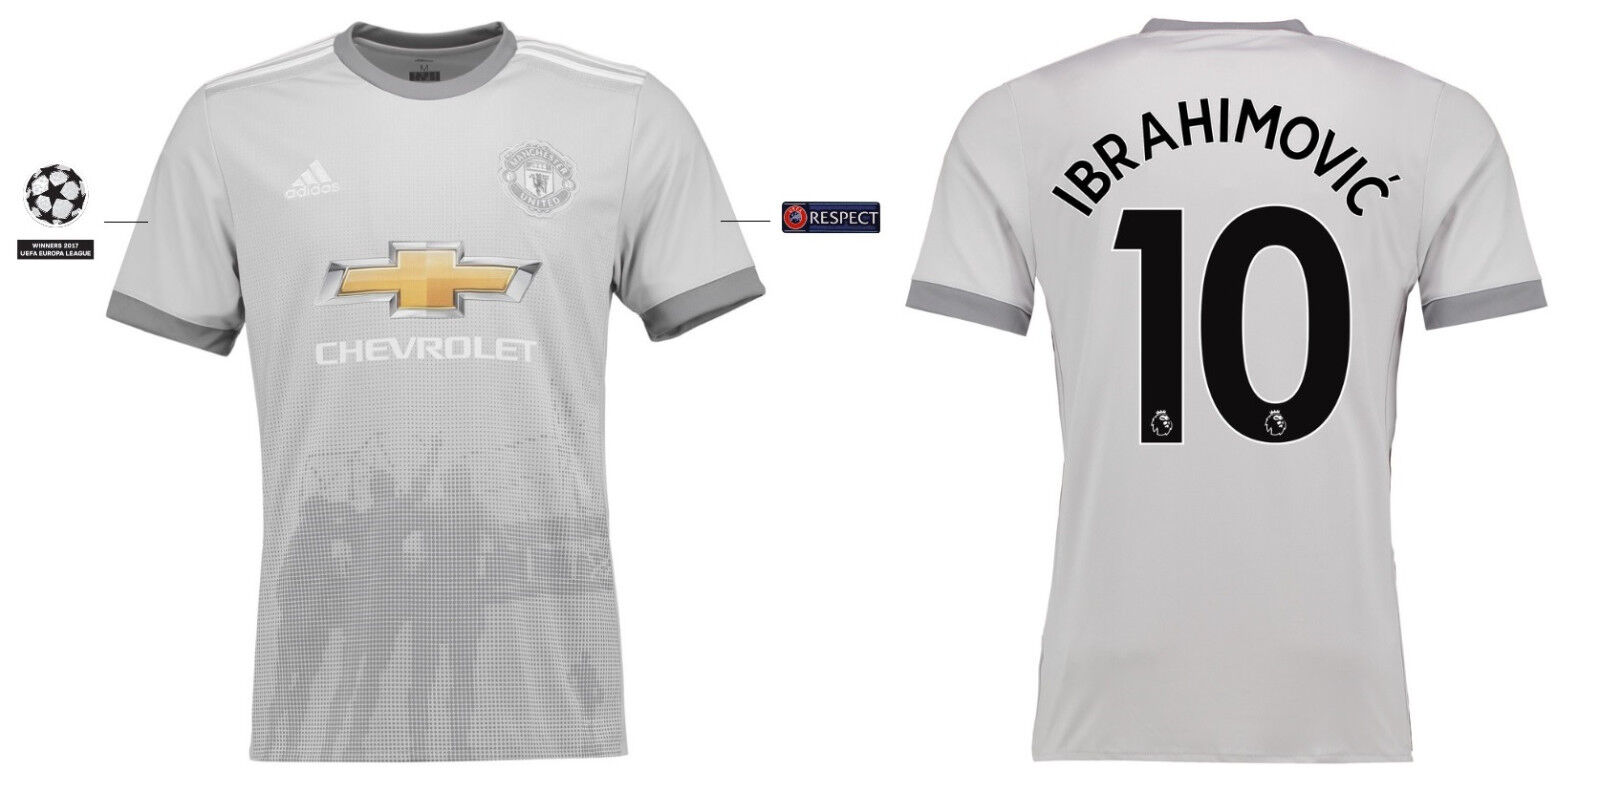 Trikot Manchester United  2017-2018 Third UCL - Ibrahimovic 10  United ManU 3rd 922834